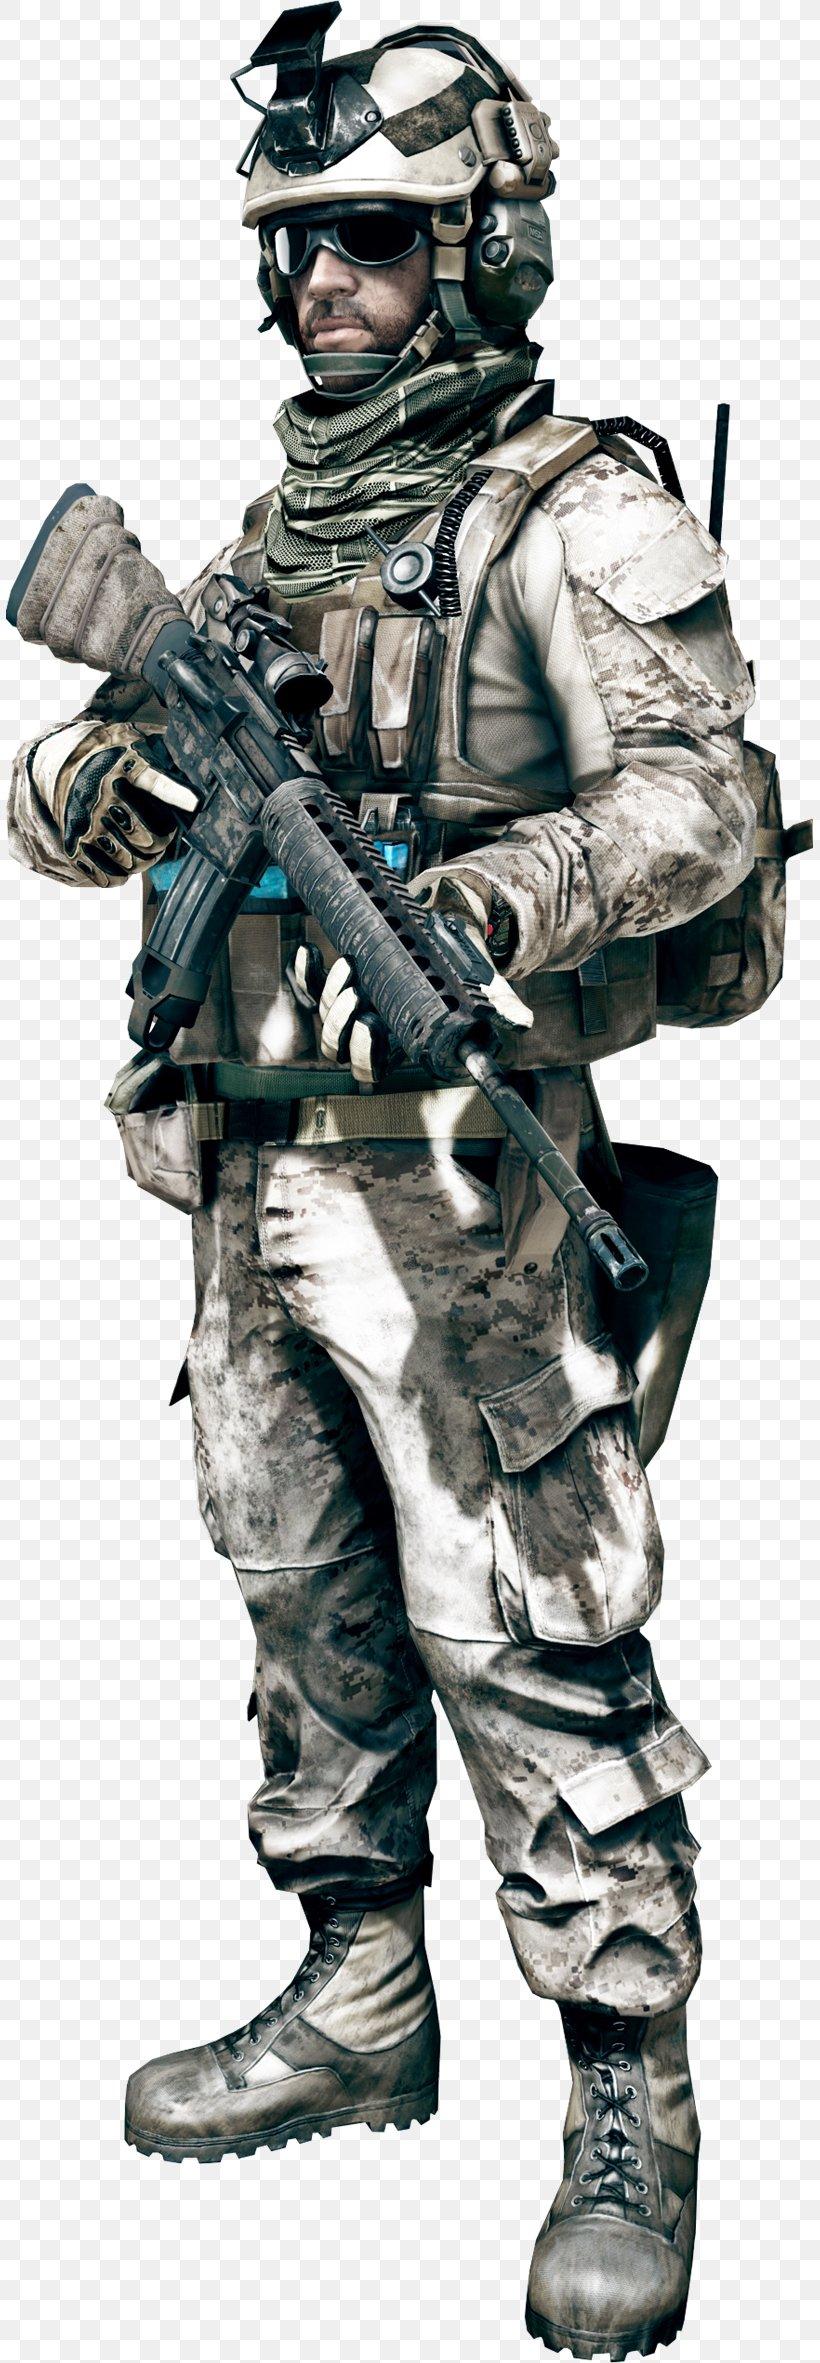 Battlefield 3 Battlefield 4 Battlefield 1 Battlefield 2 Battlefield: Bad Company 2, PNG, 807x2363px, Battlefield 3, Armour, Army, Assault Rifle, Battlefield Download Free